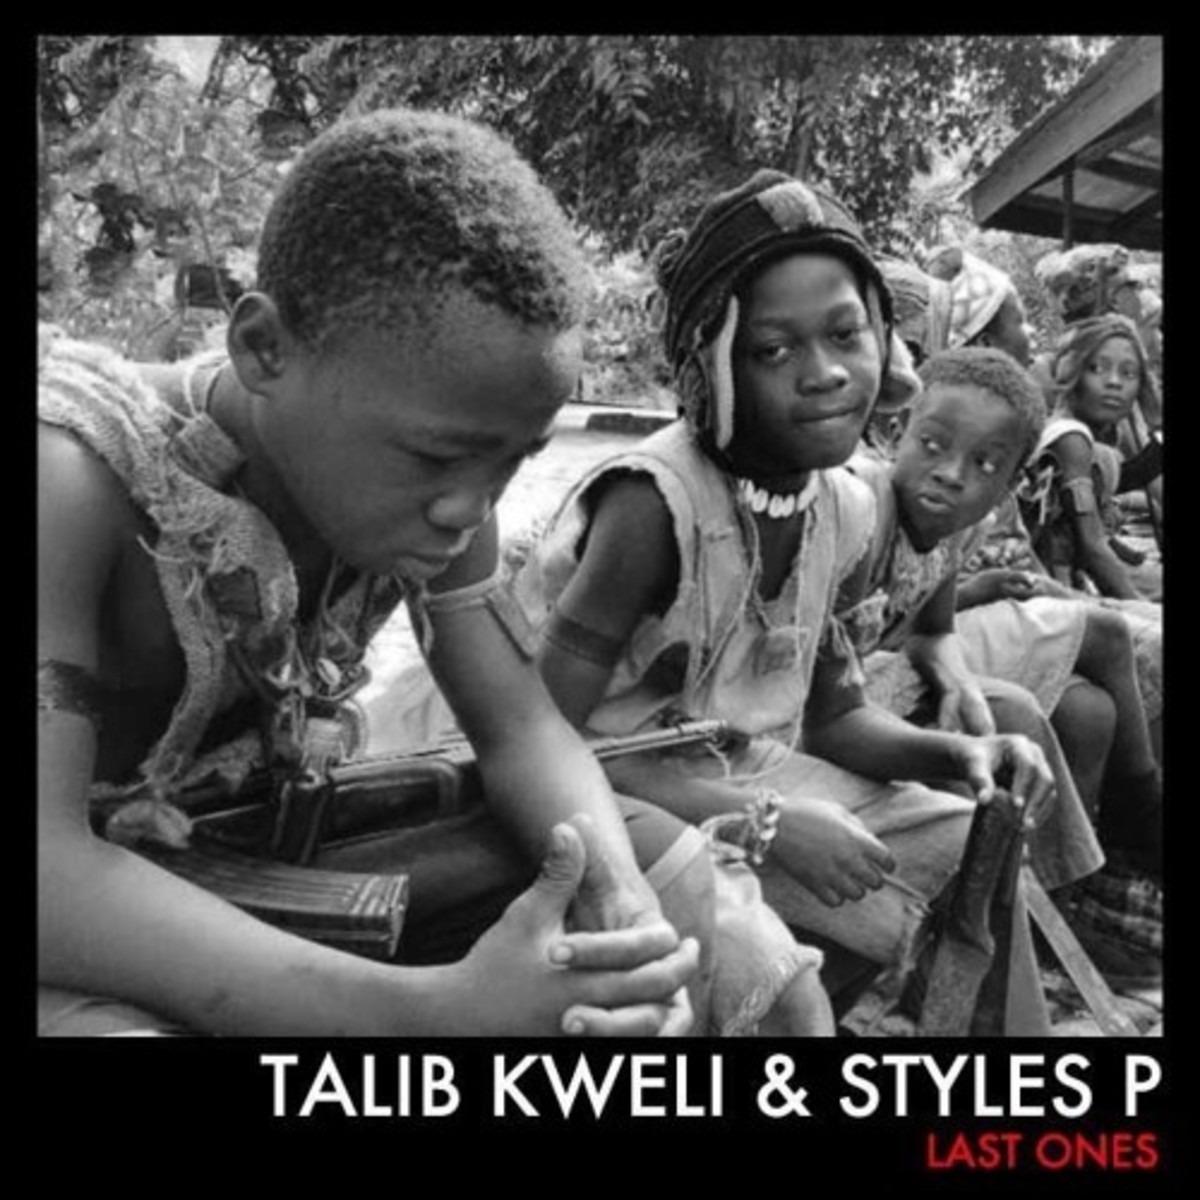 talib-kweli-styles-p-last-ones.jpg